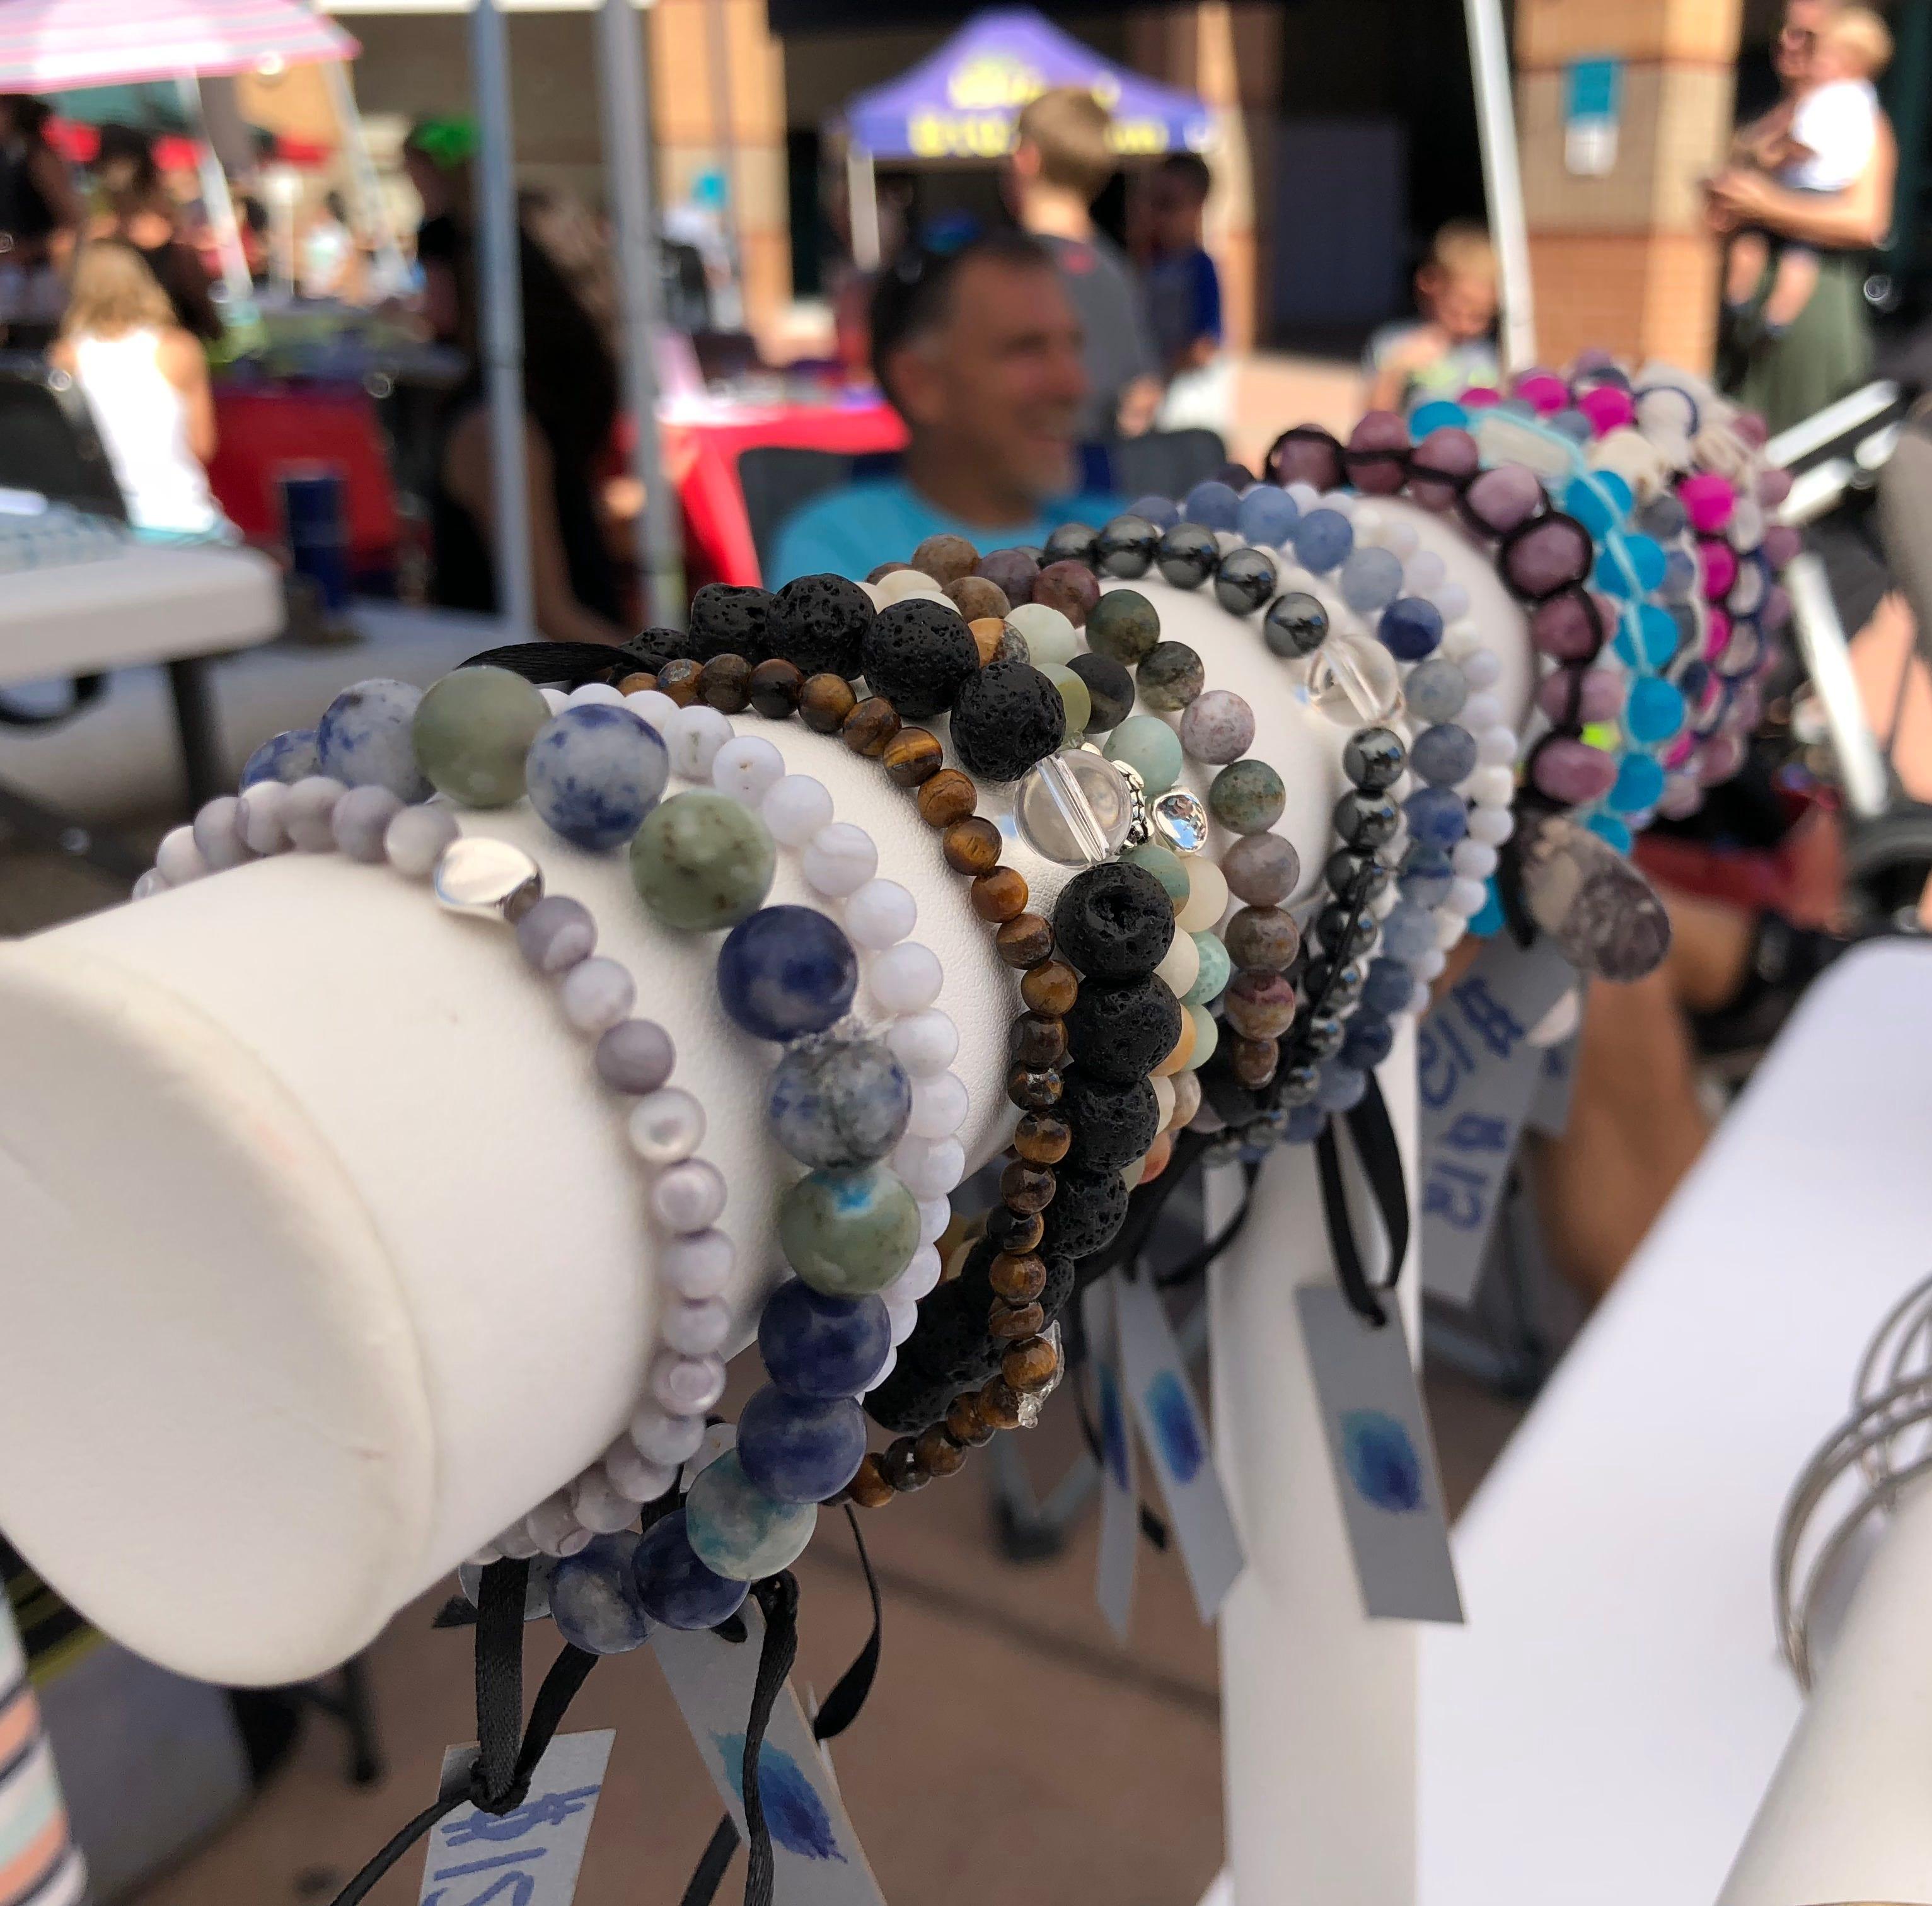 No kidding: Young entrepreneurs flex their business sense at Collier event